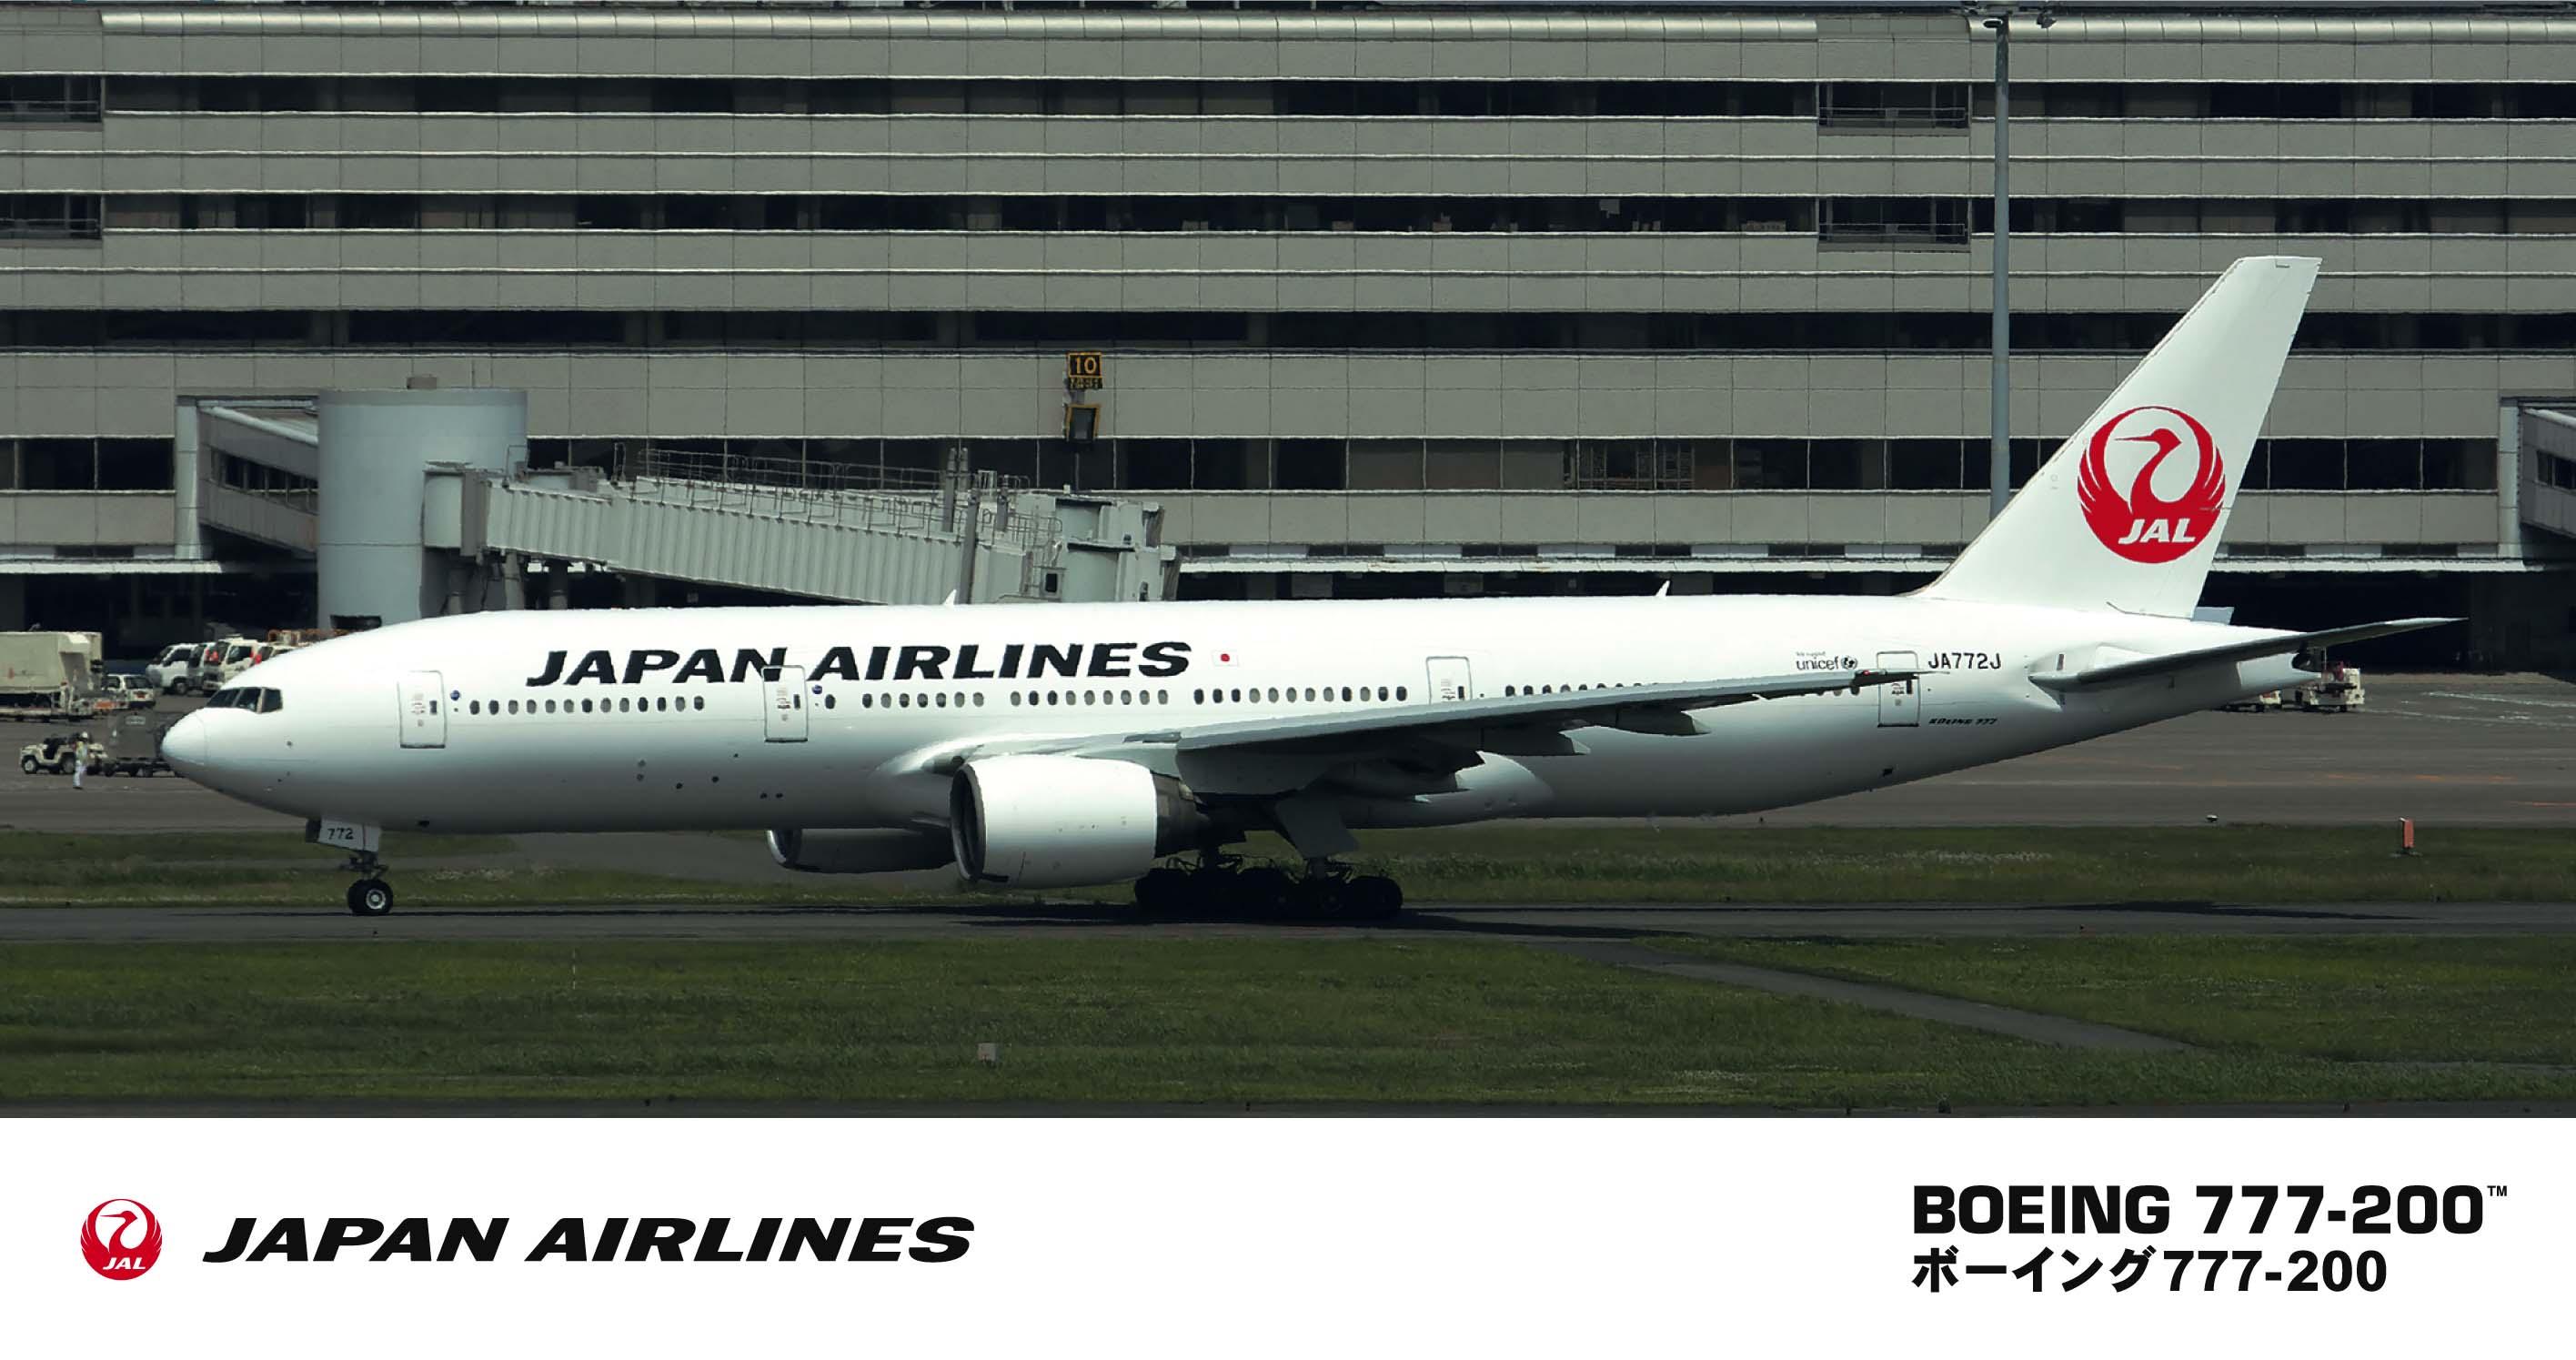 Hasegawa 1/200 Jal B777-200 (New Logo Marking)